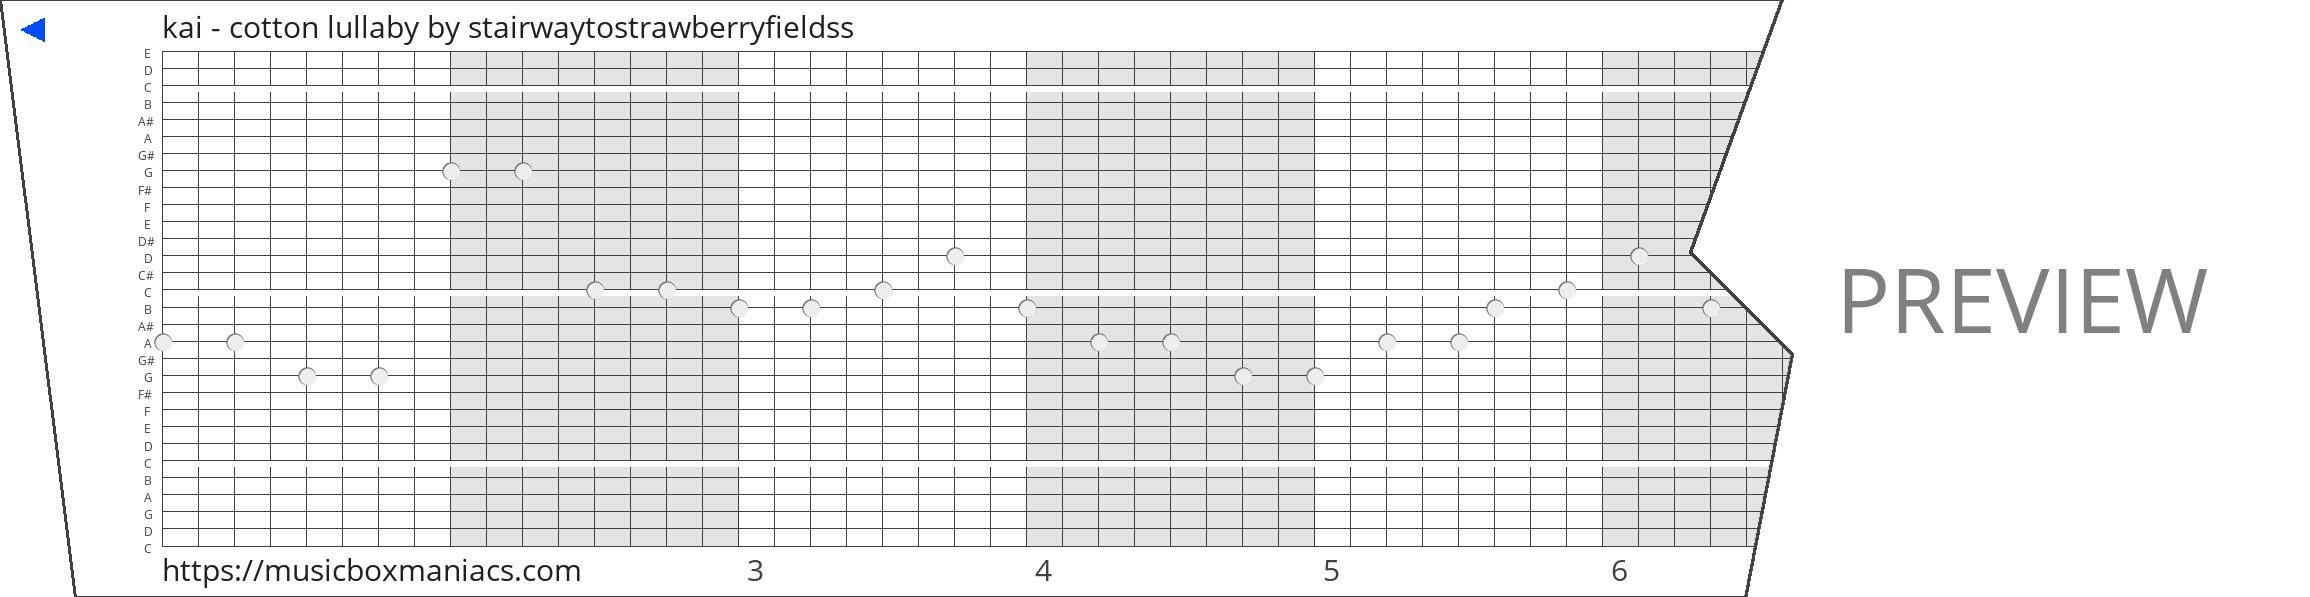 kai - cotton lullaby 30 note music box paper strip